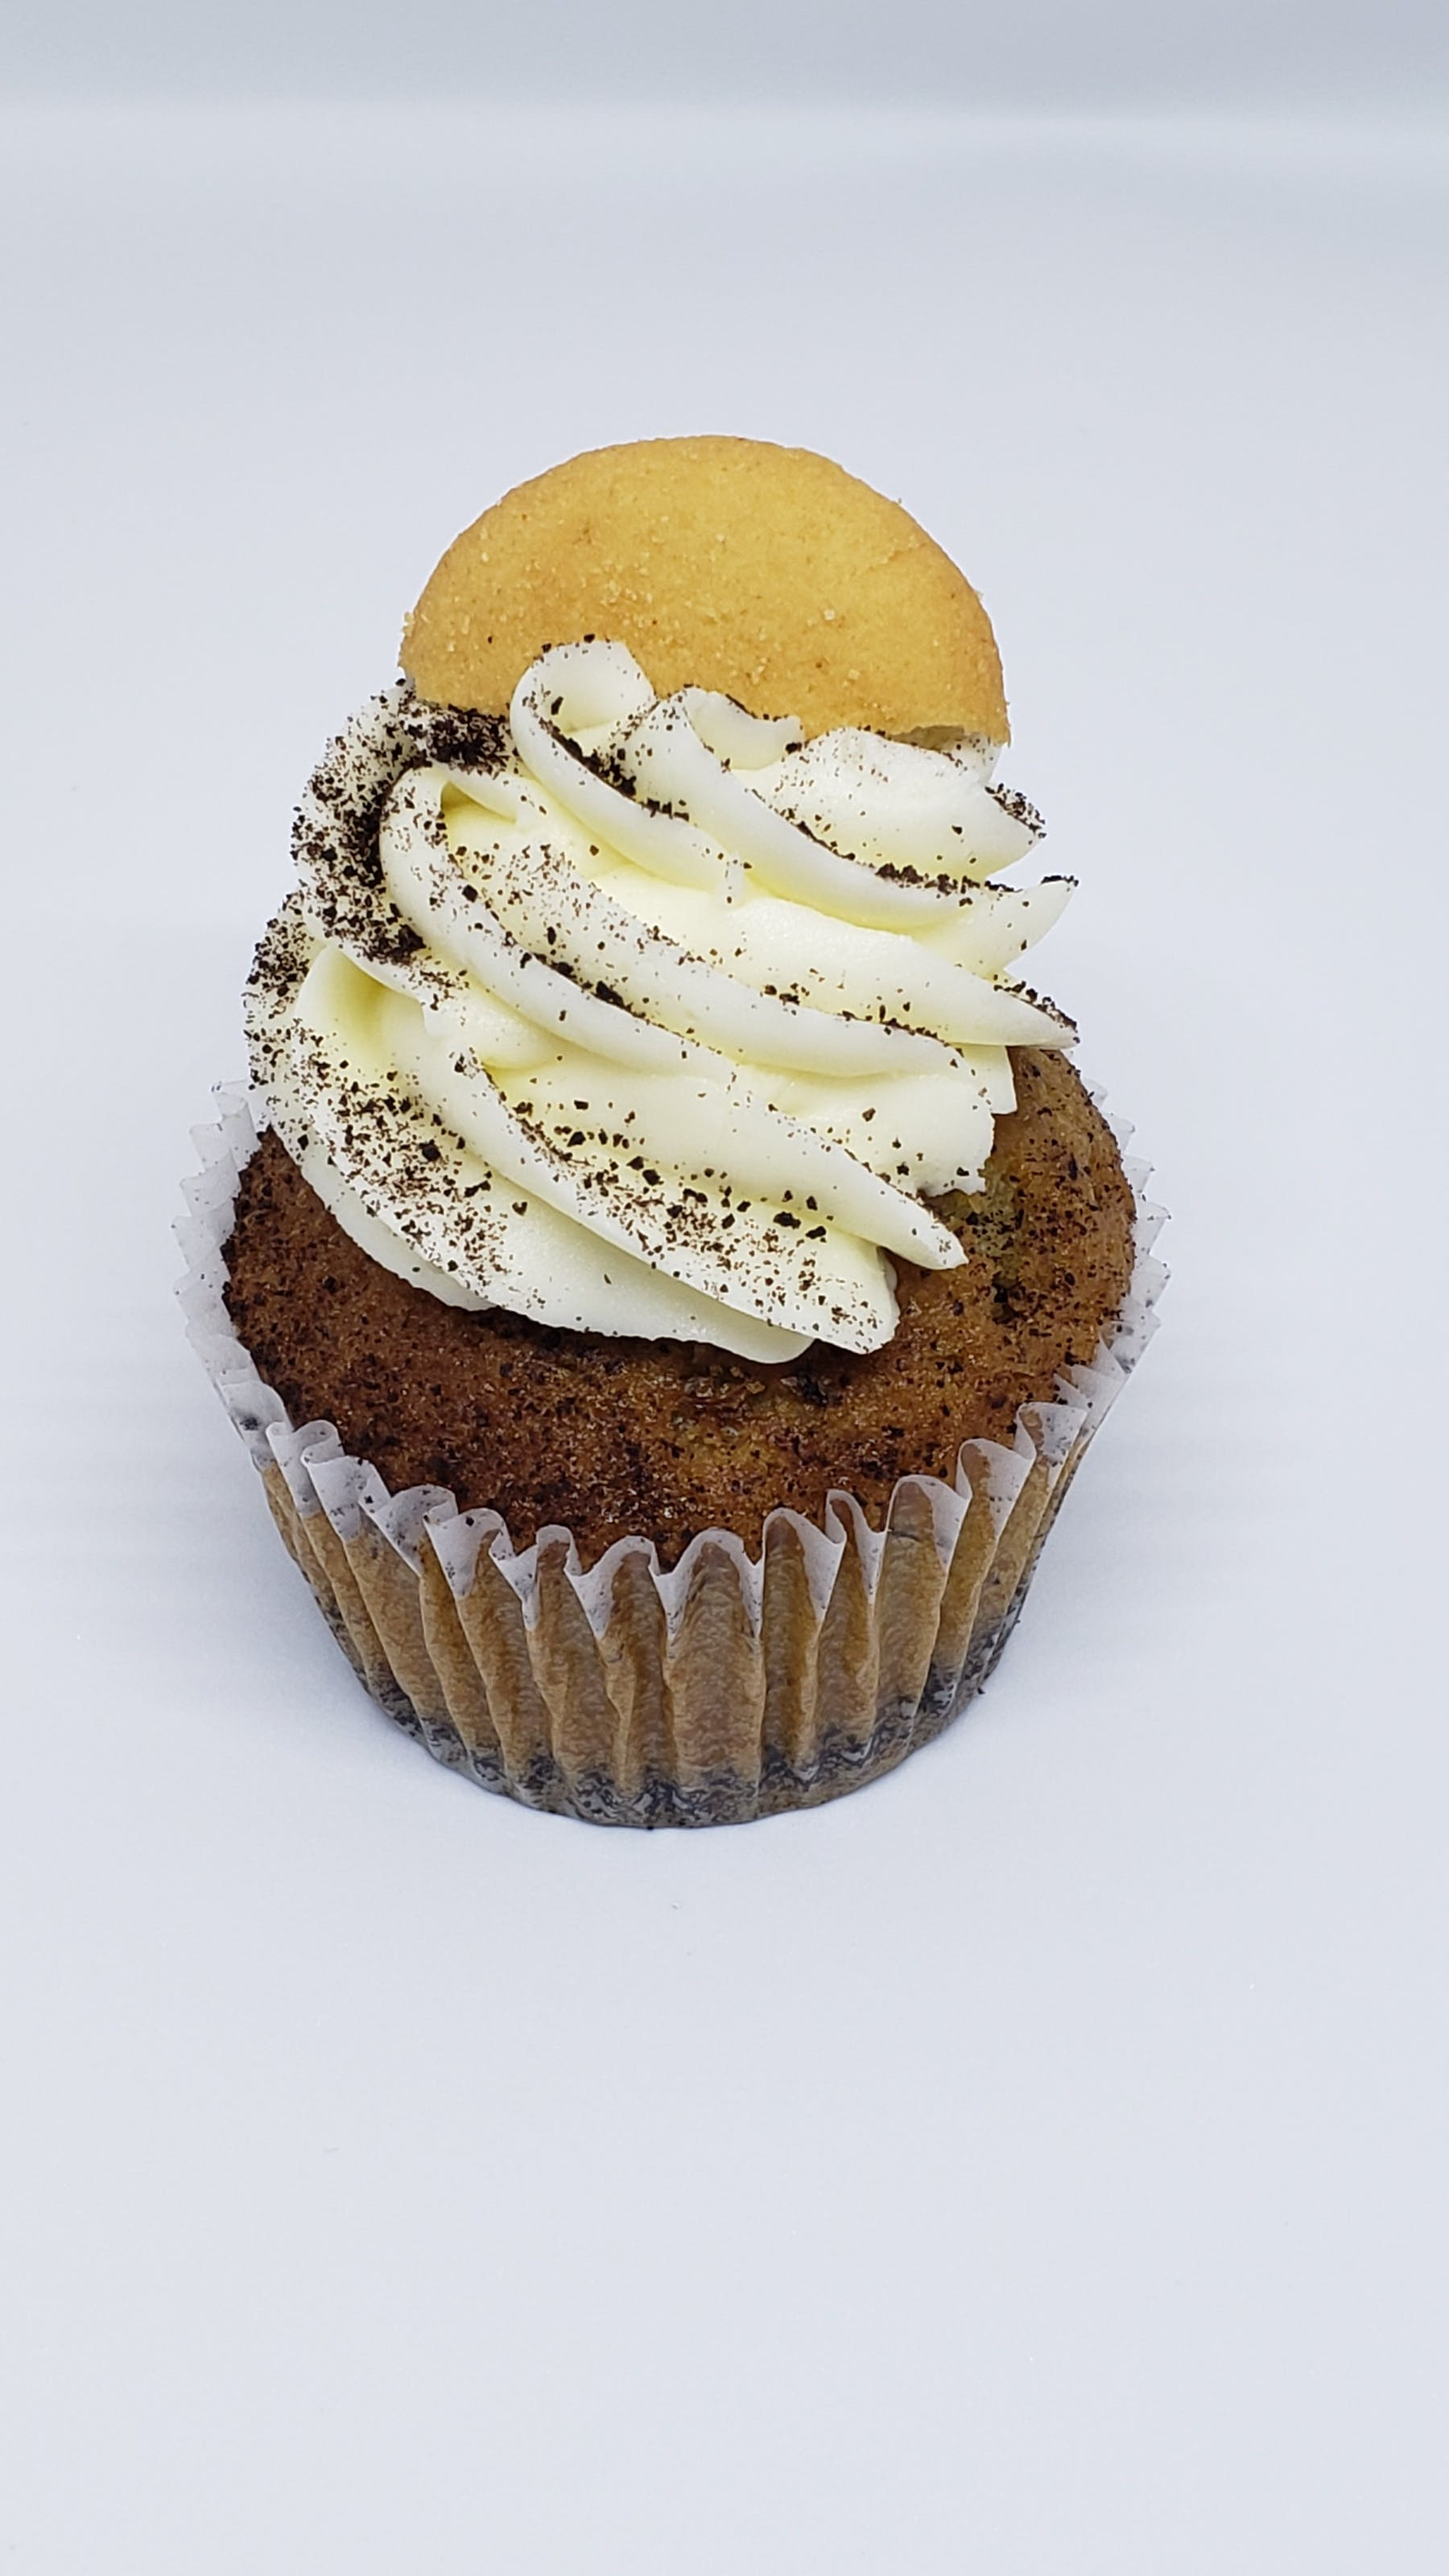 James The Giant Cupcake